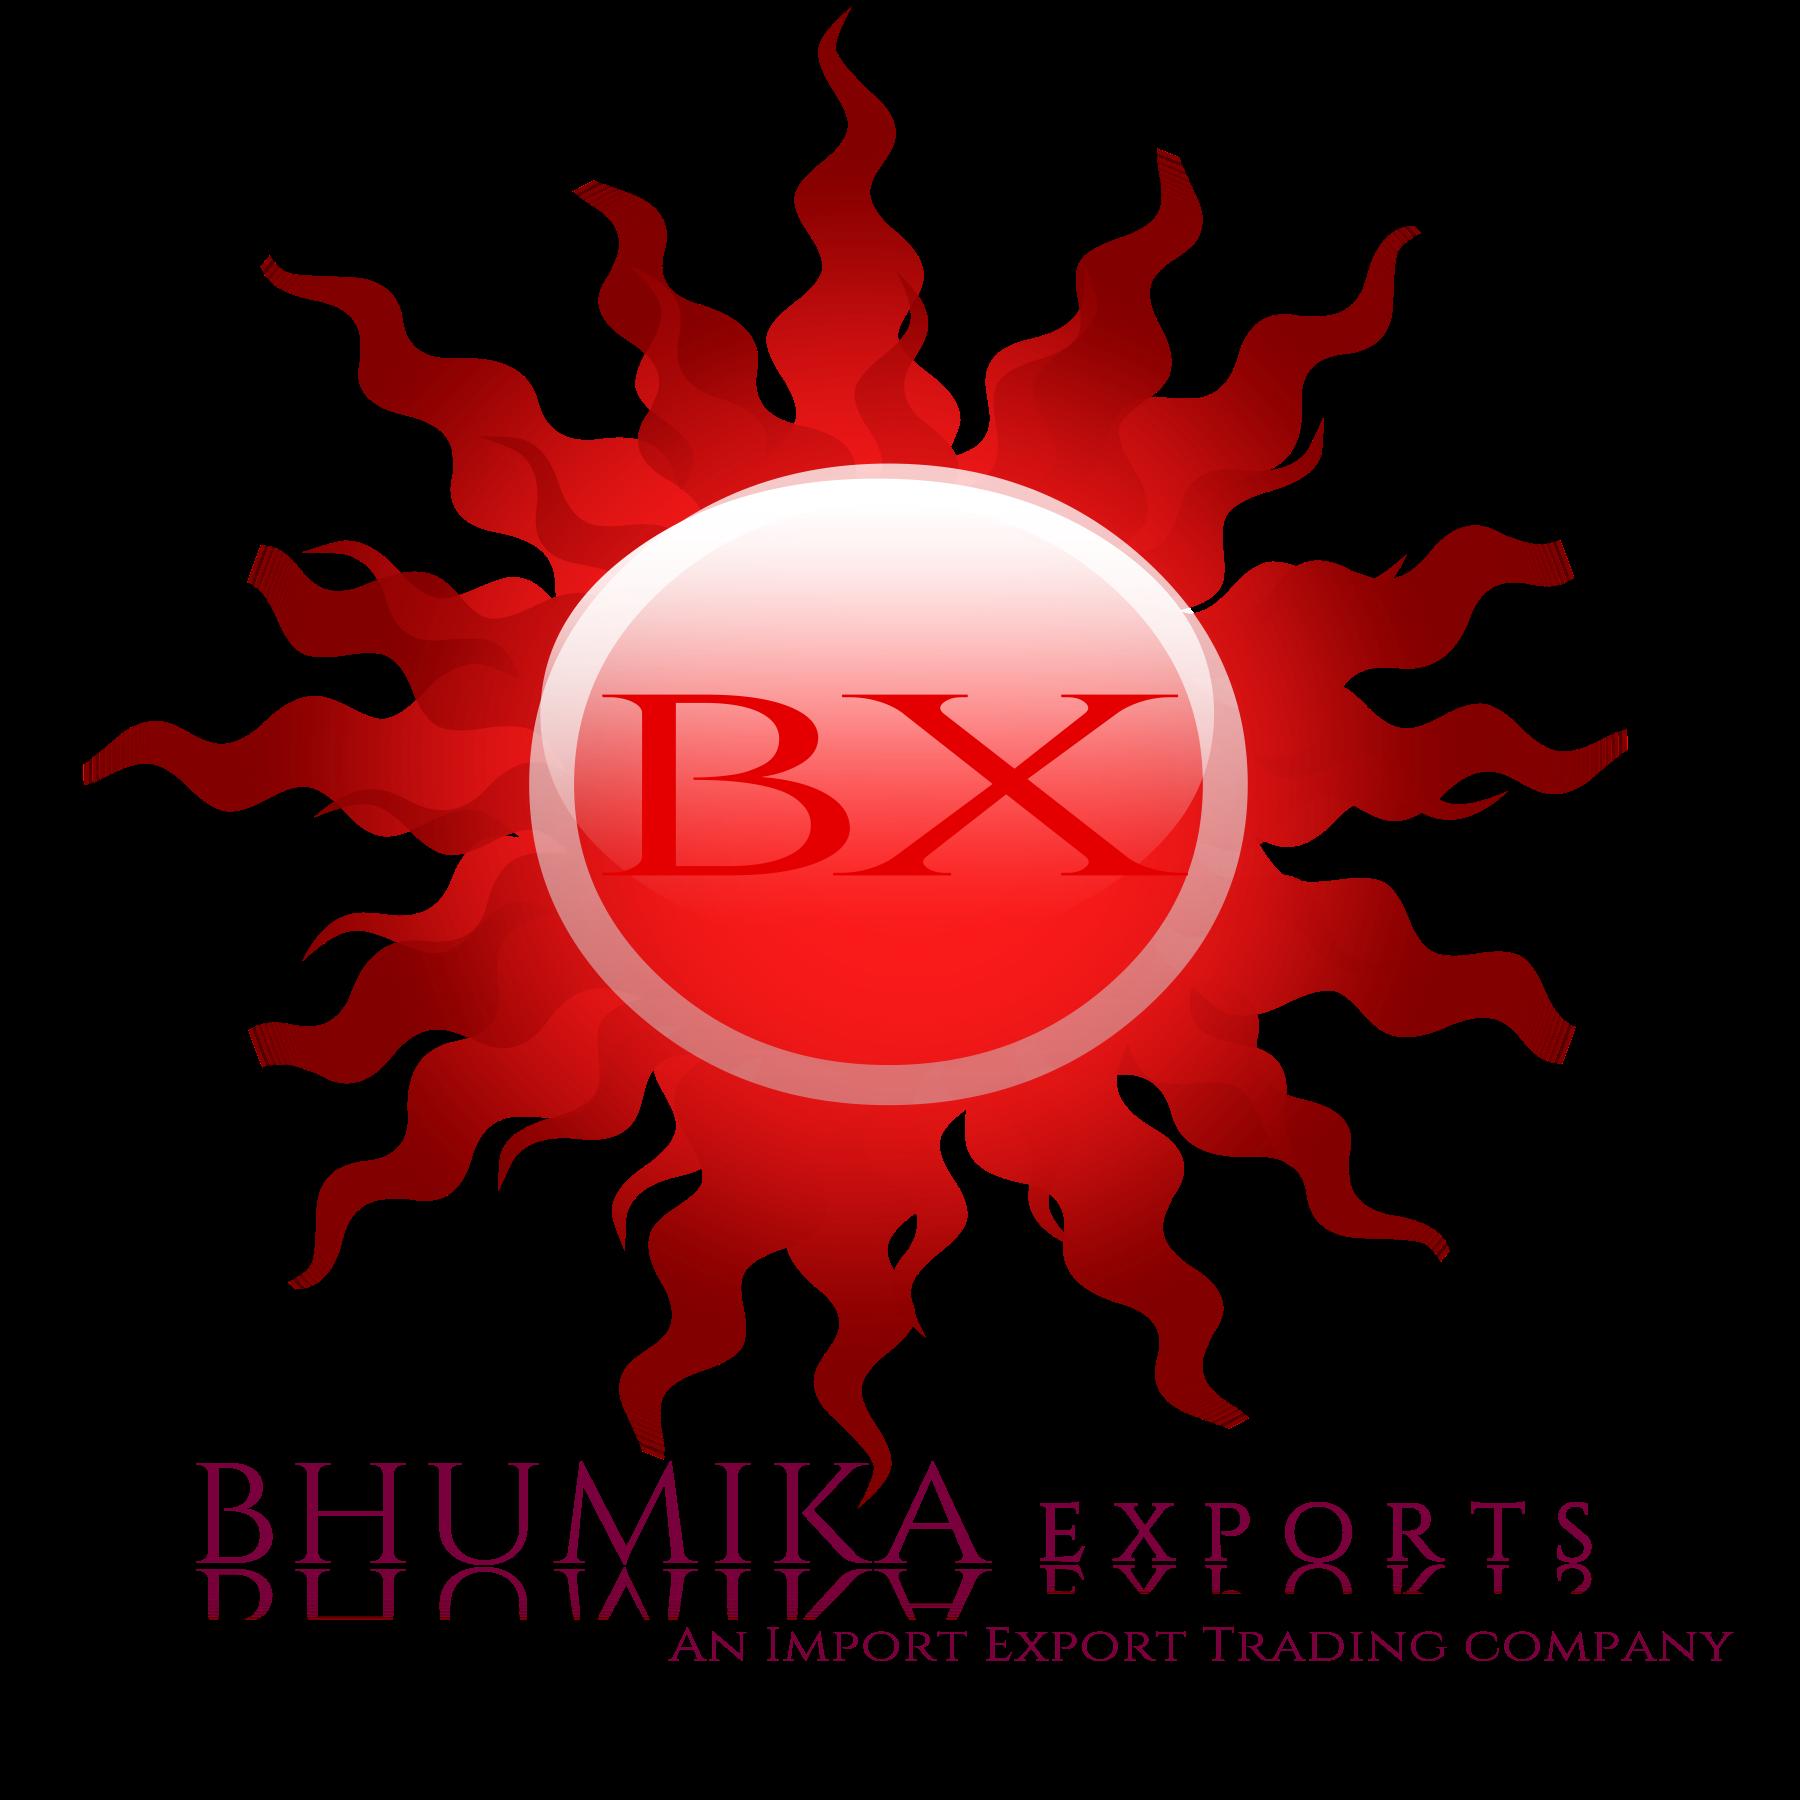 Bhumika Exports